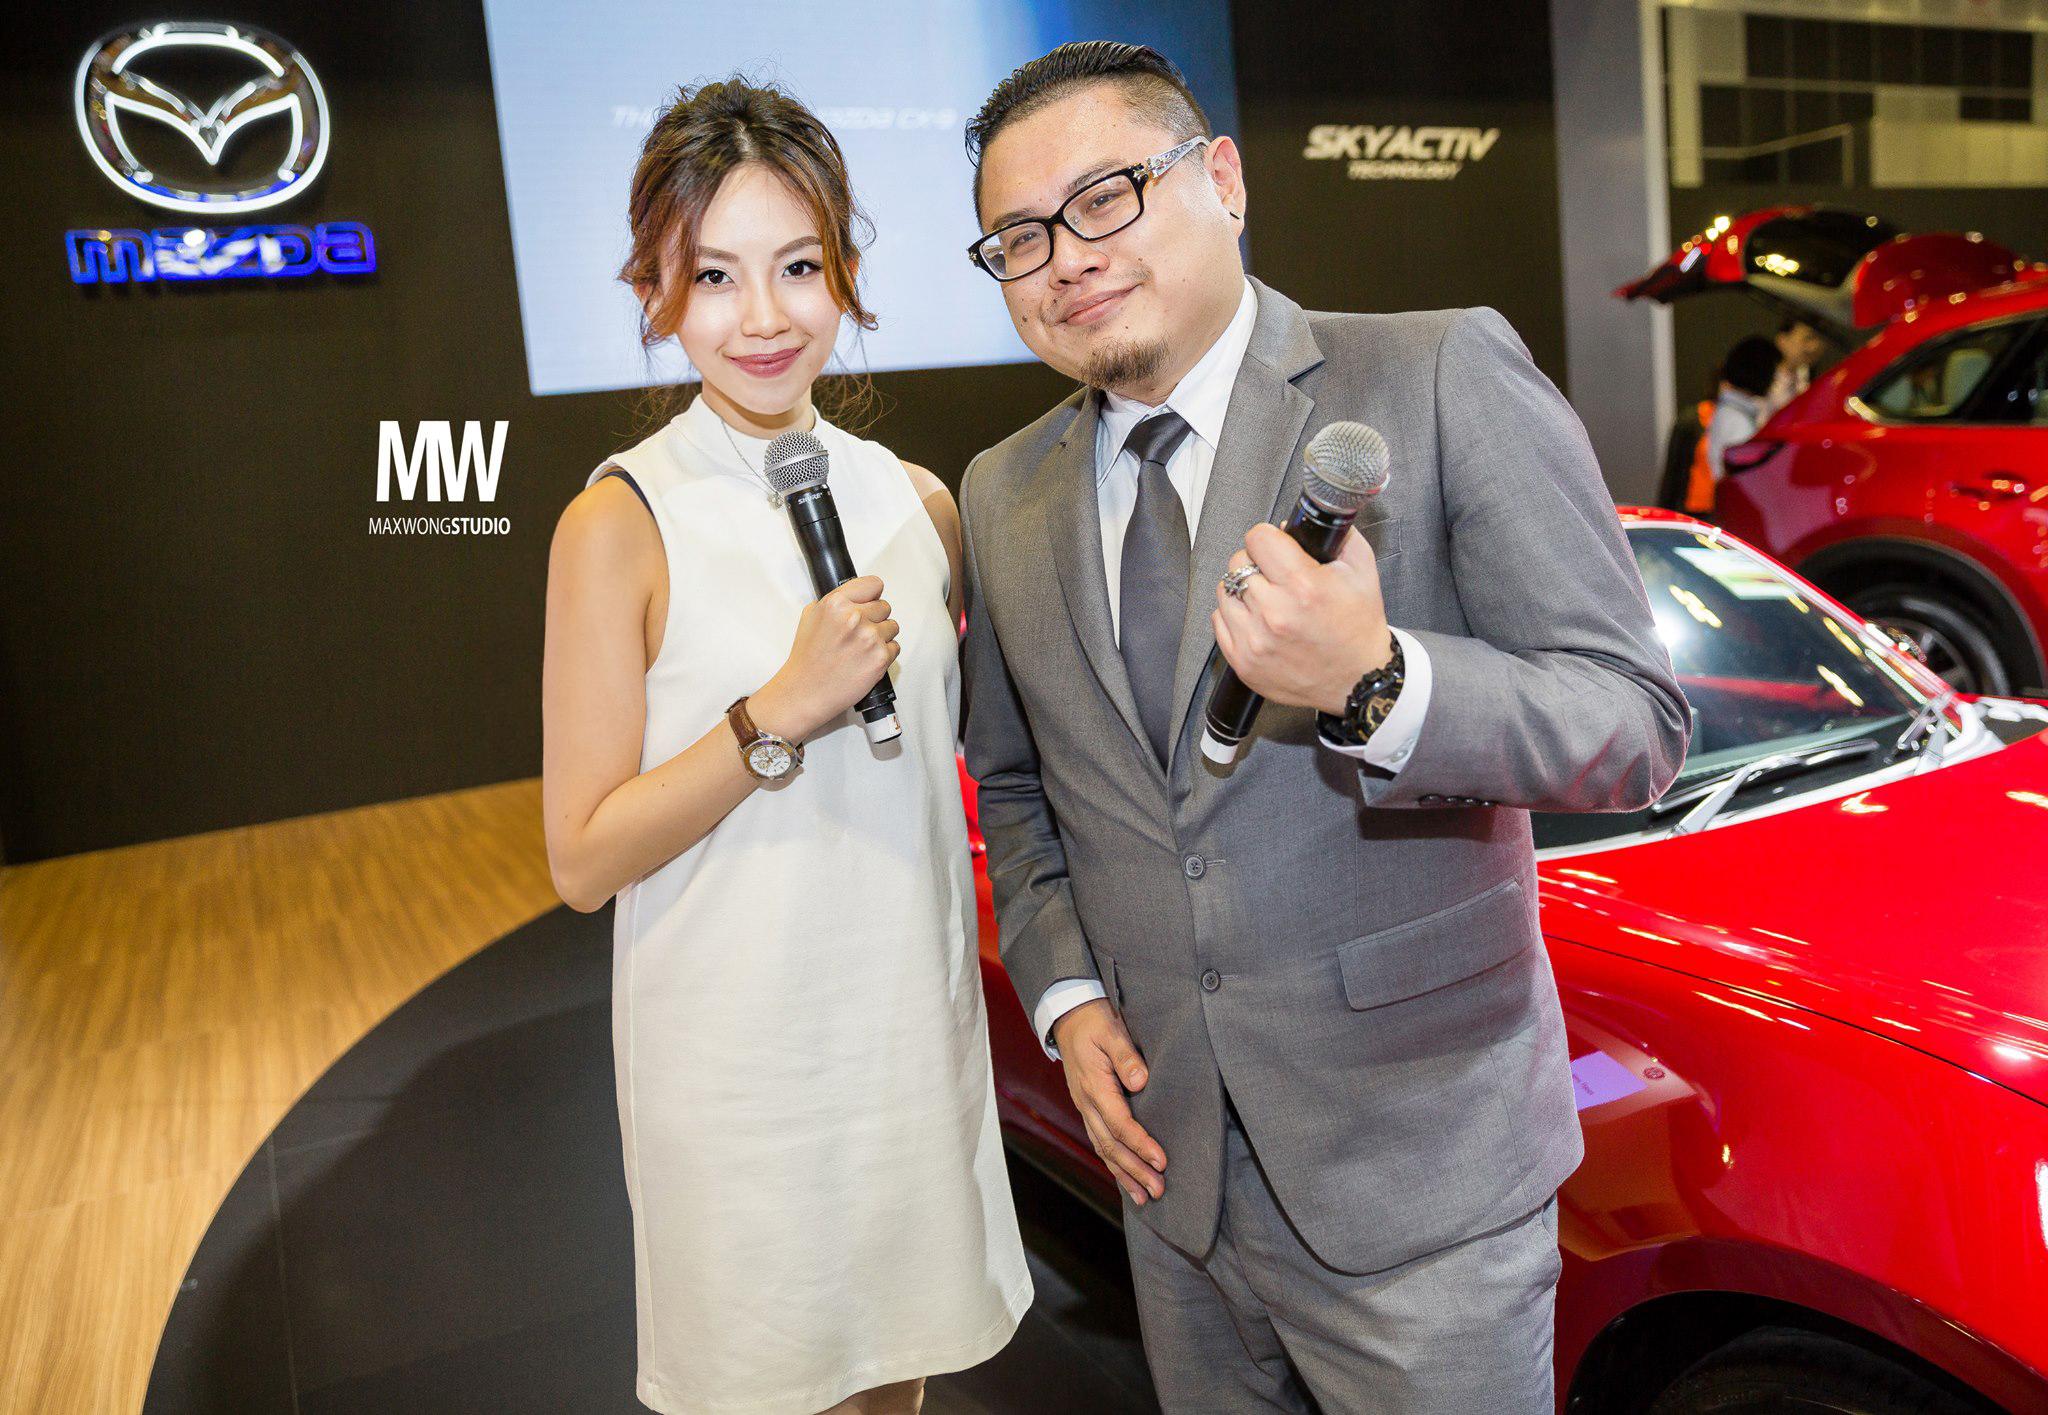 Singapore Motorshow 2017 (Mazda)